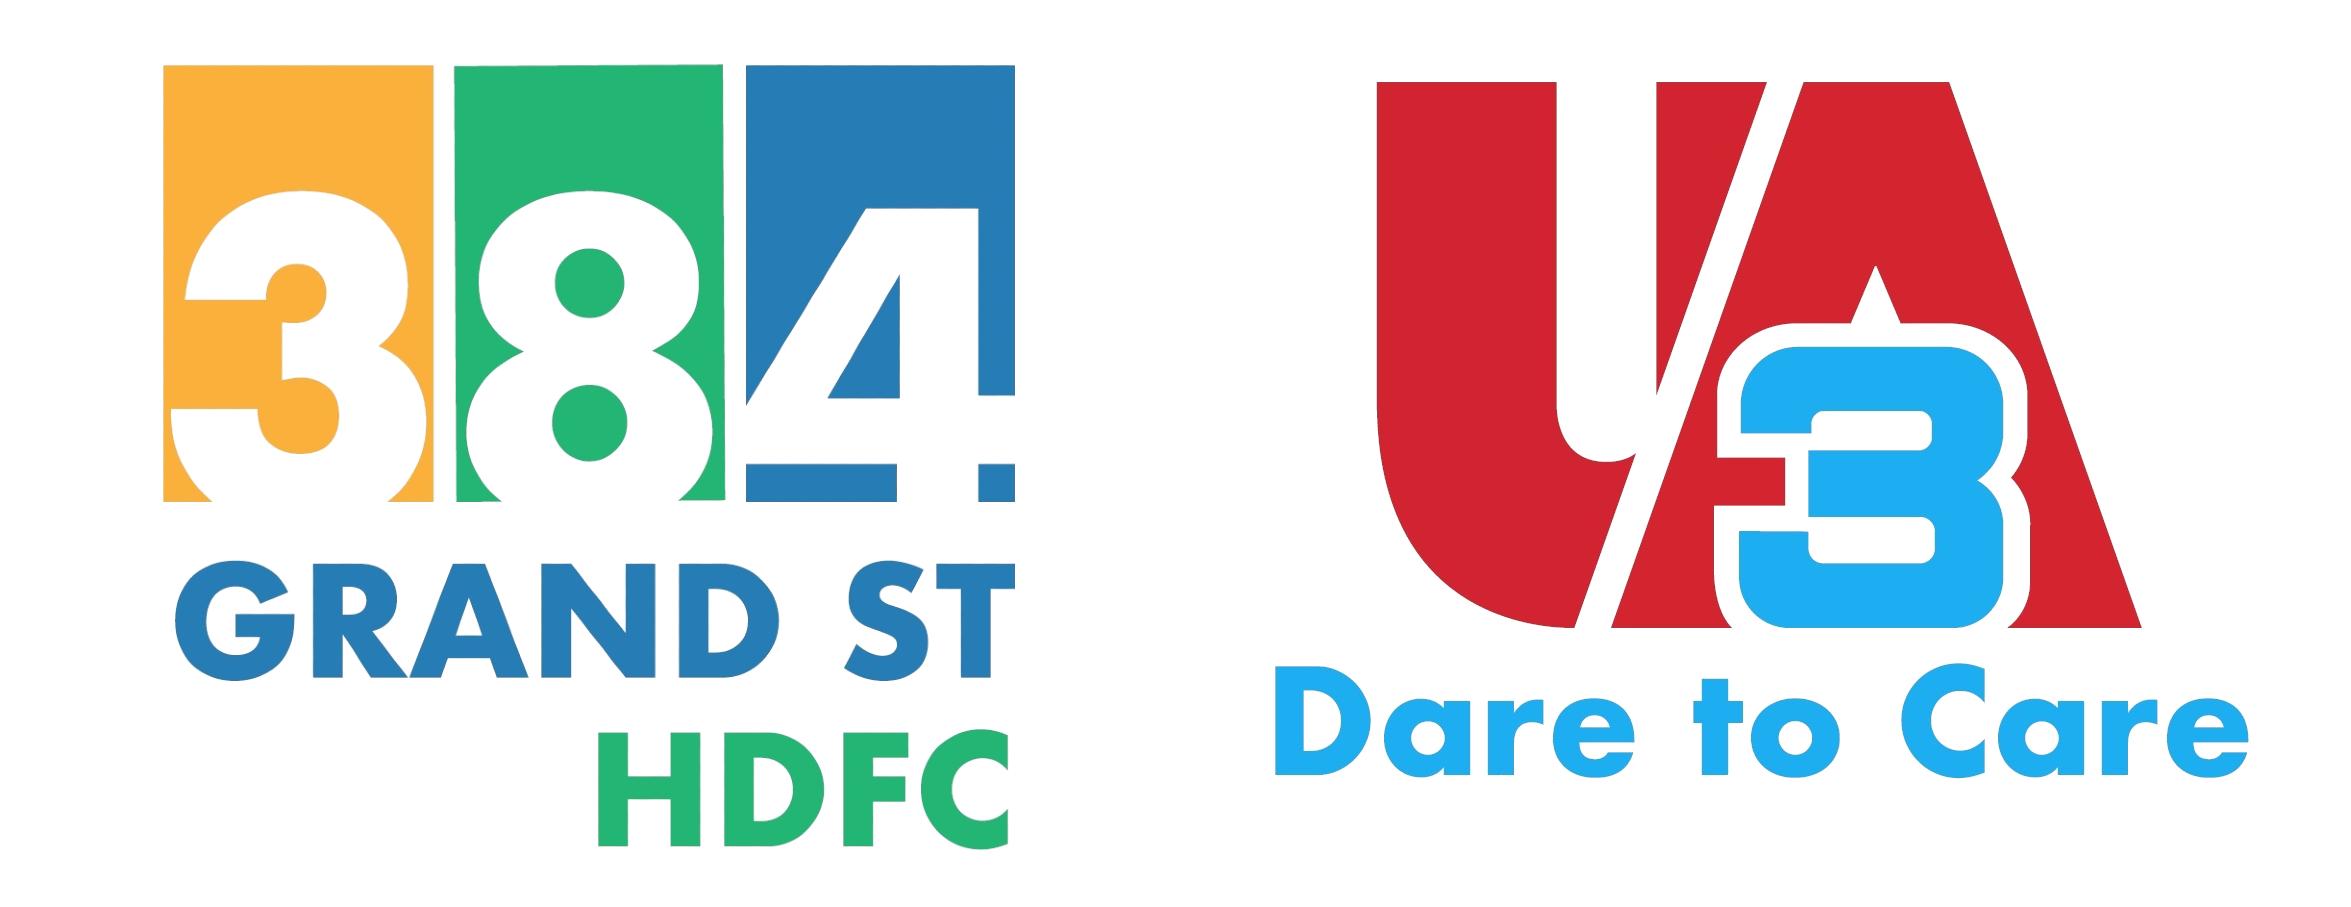 384 Grand Street HDFC & UA3